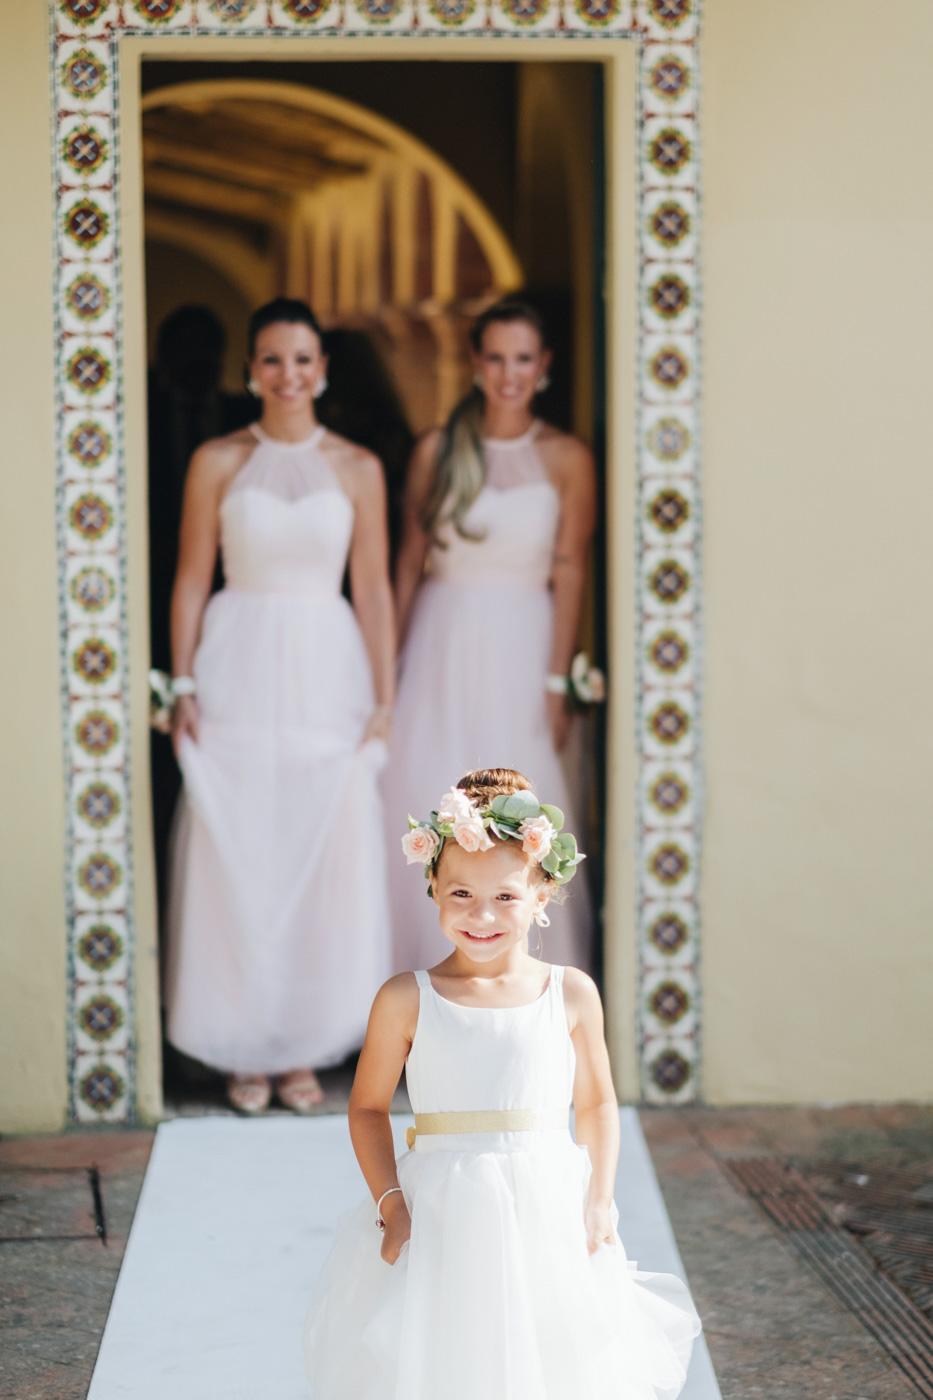 Matrimoni all'italiana wedding photographer italy-54.jpg